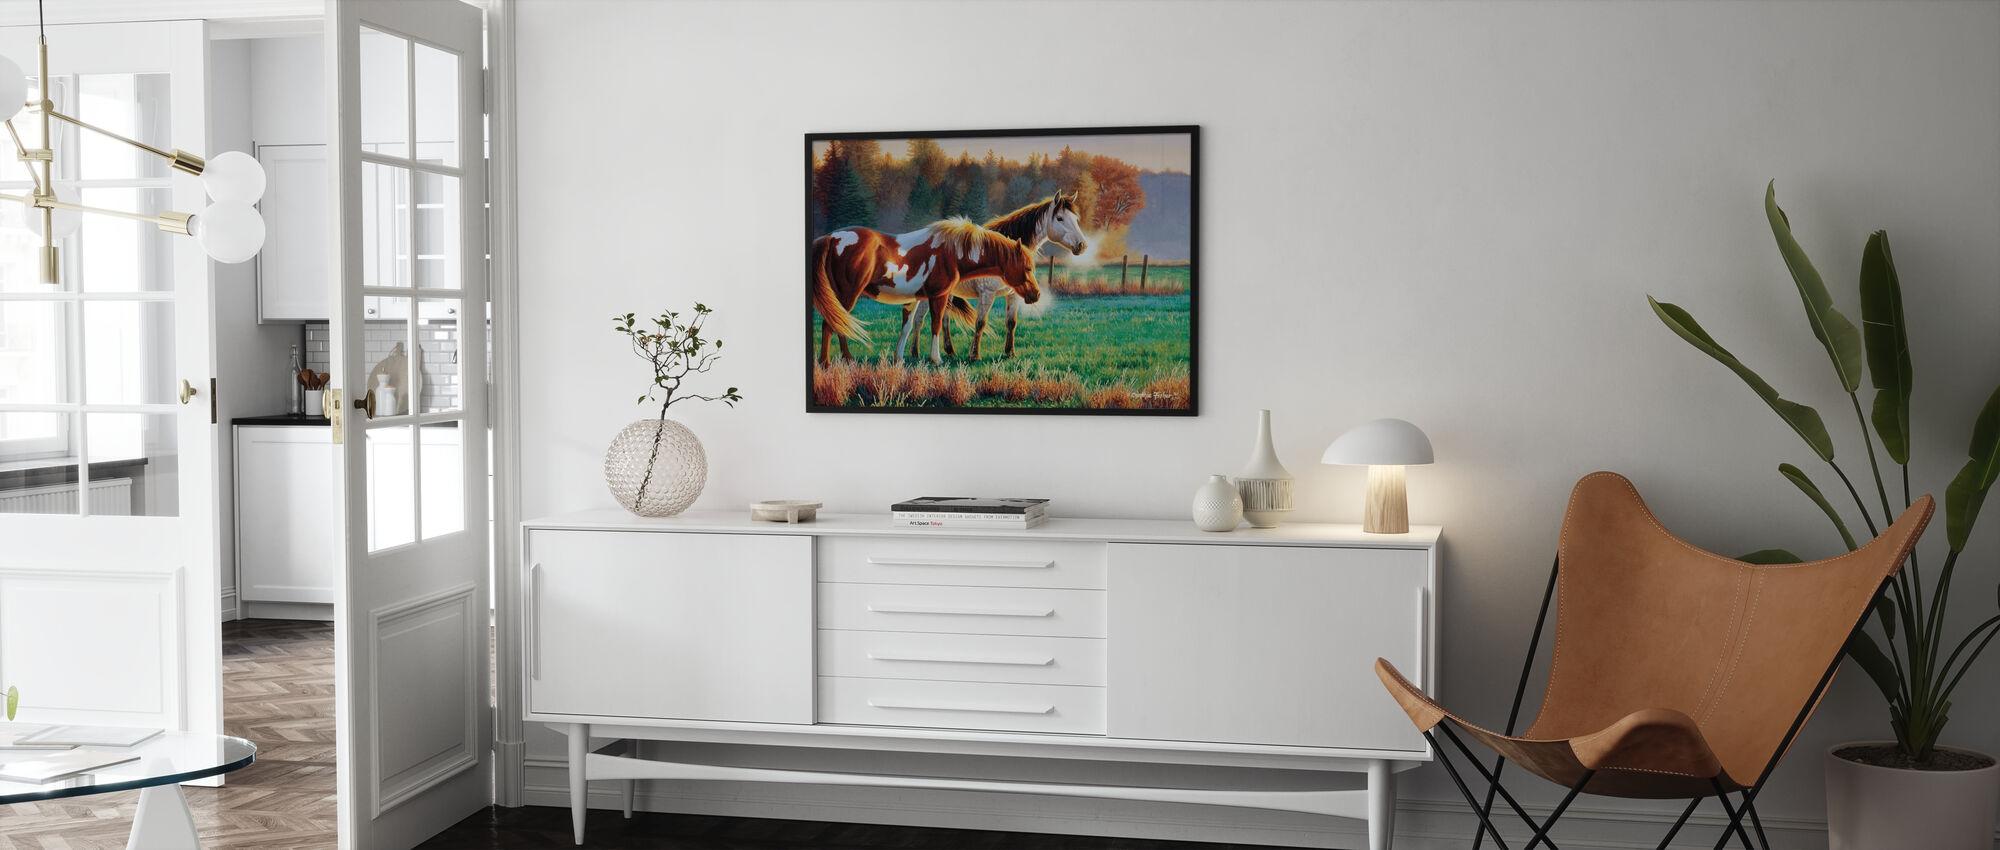 Pasture Buddies - Poster - Living Room